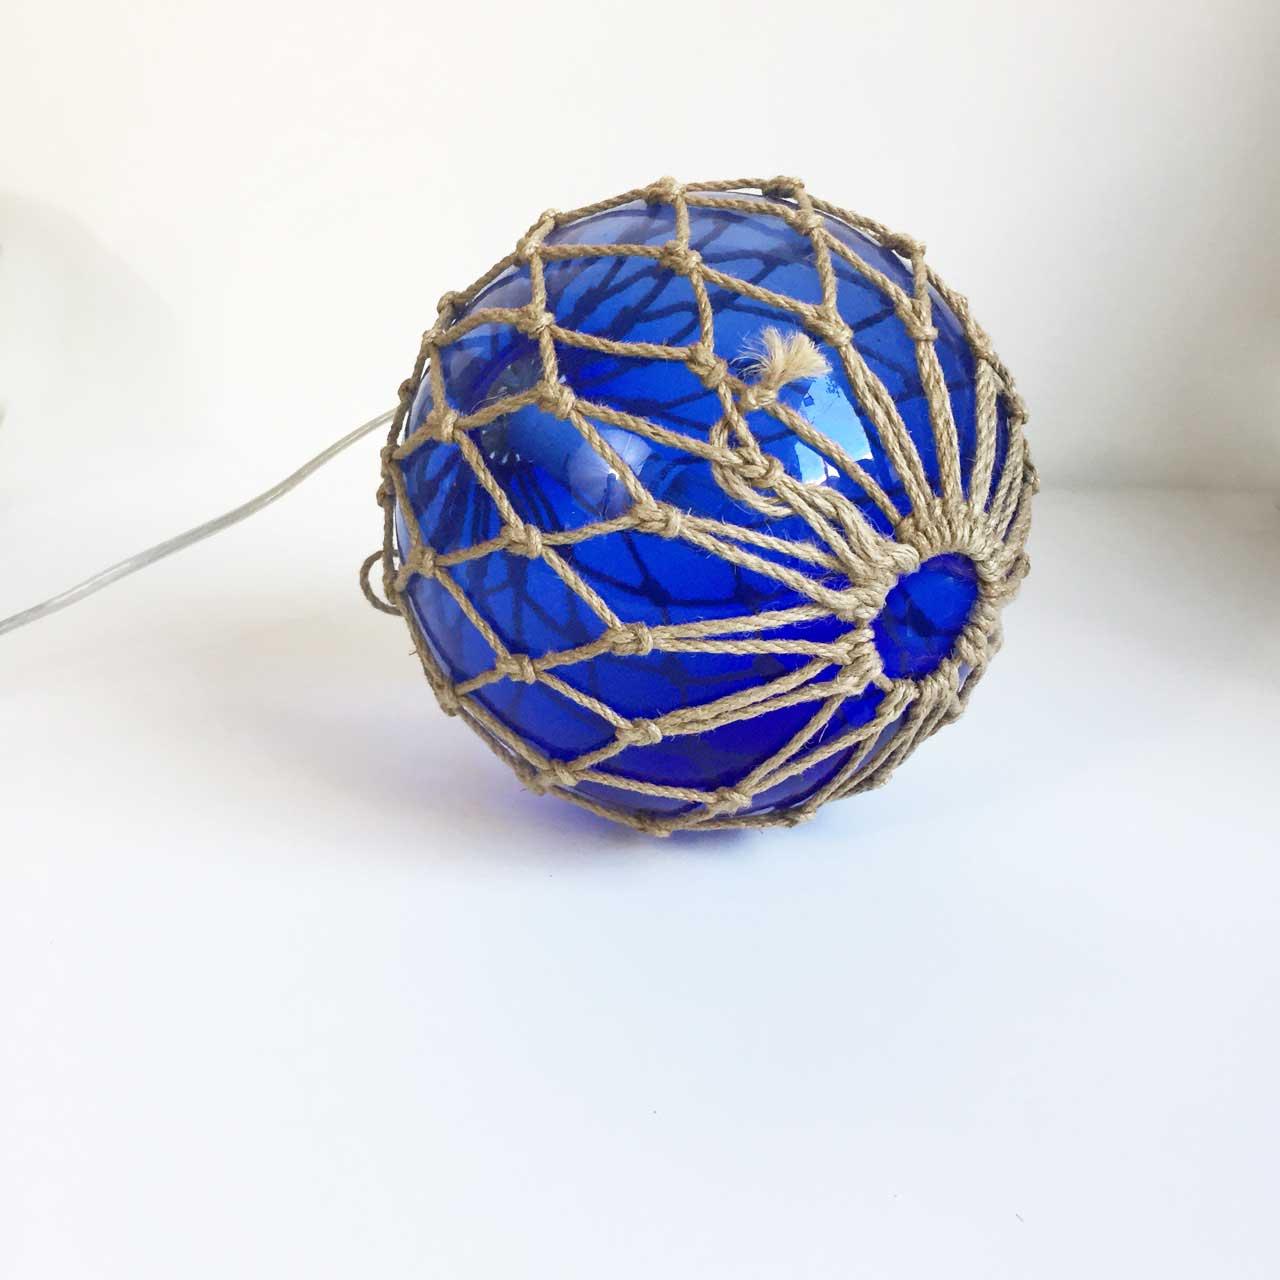 BUOY LAMP, BLUE